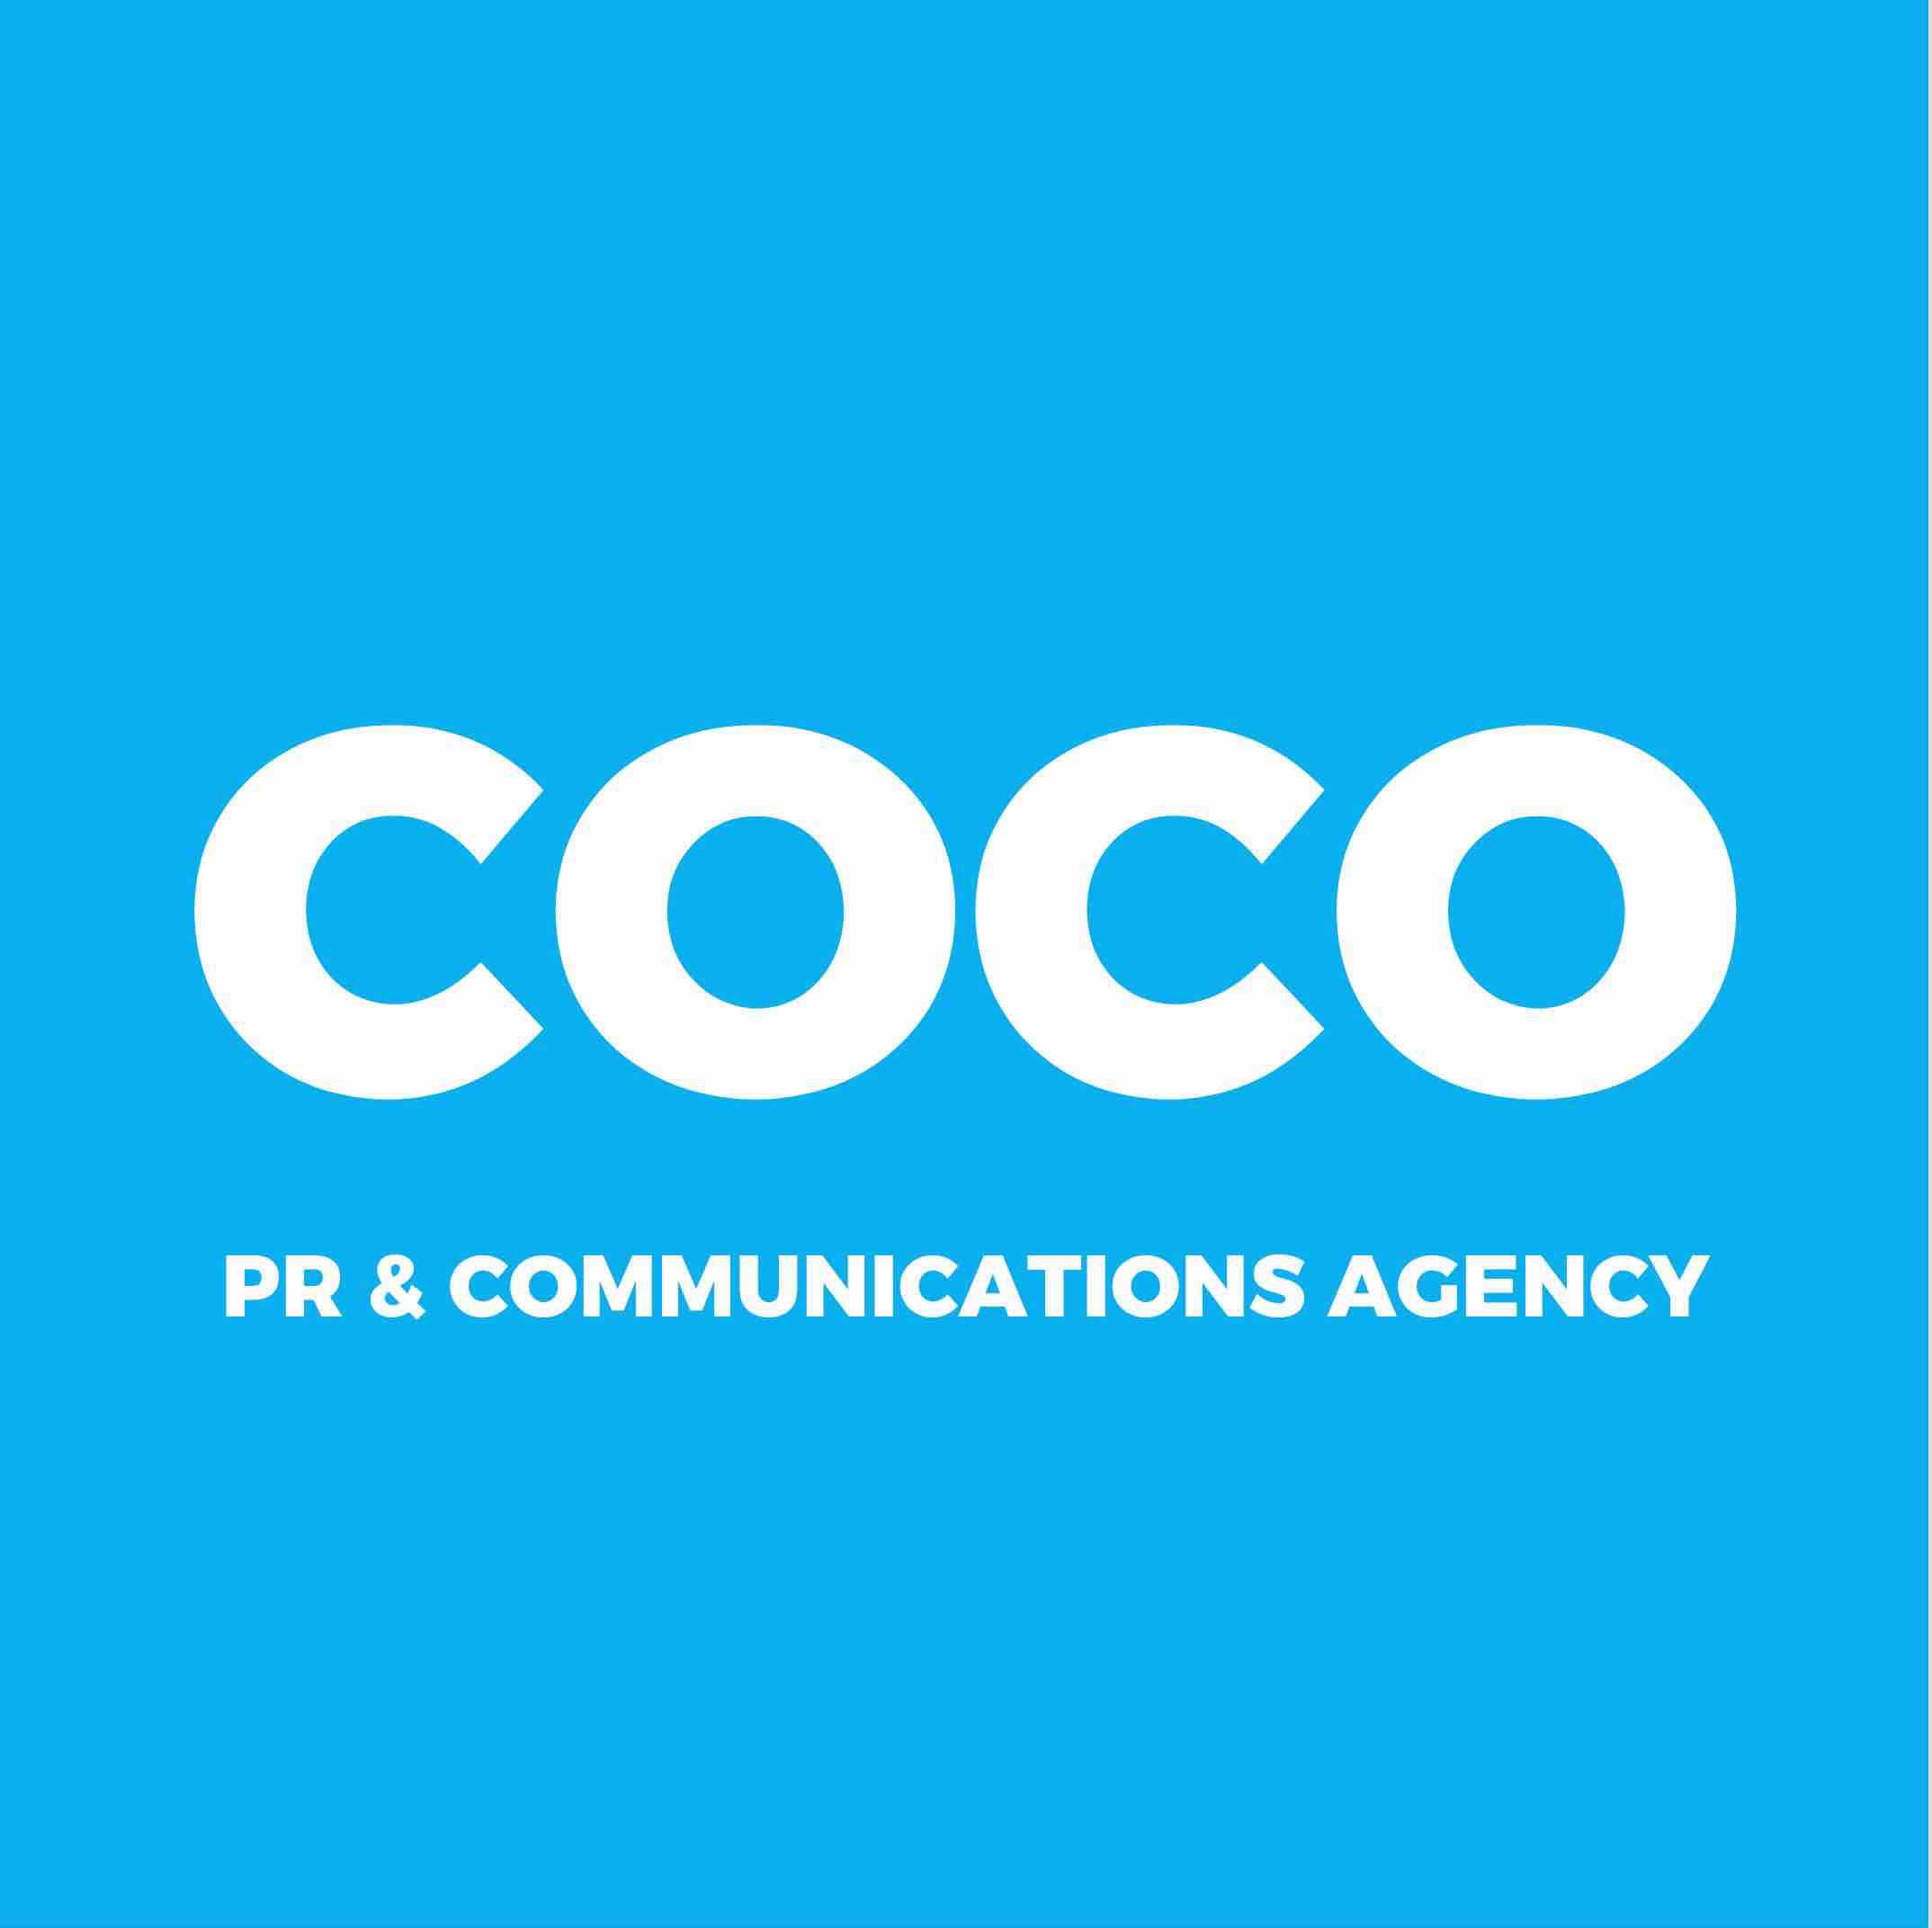 coco pr communications agency singapore